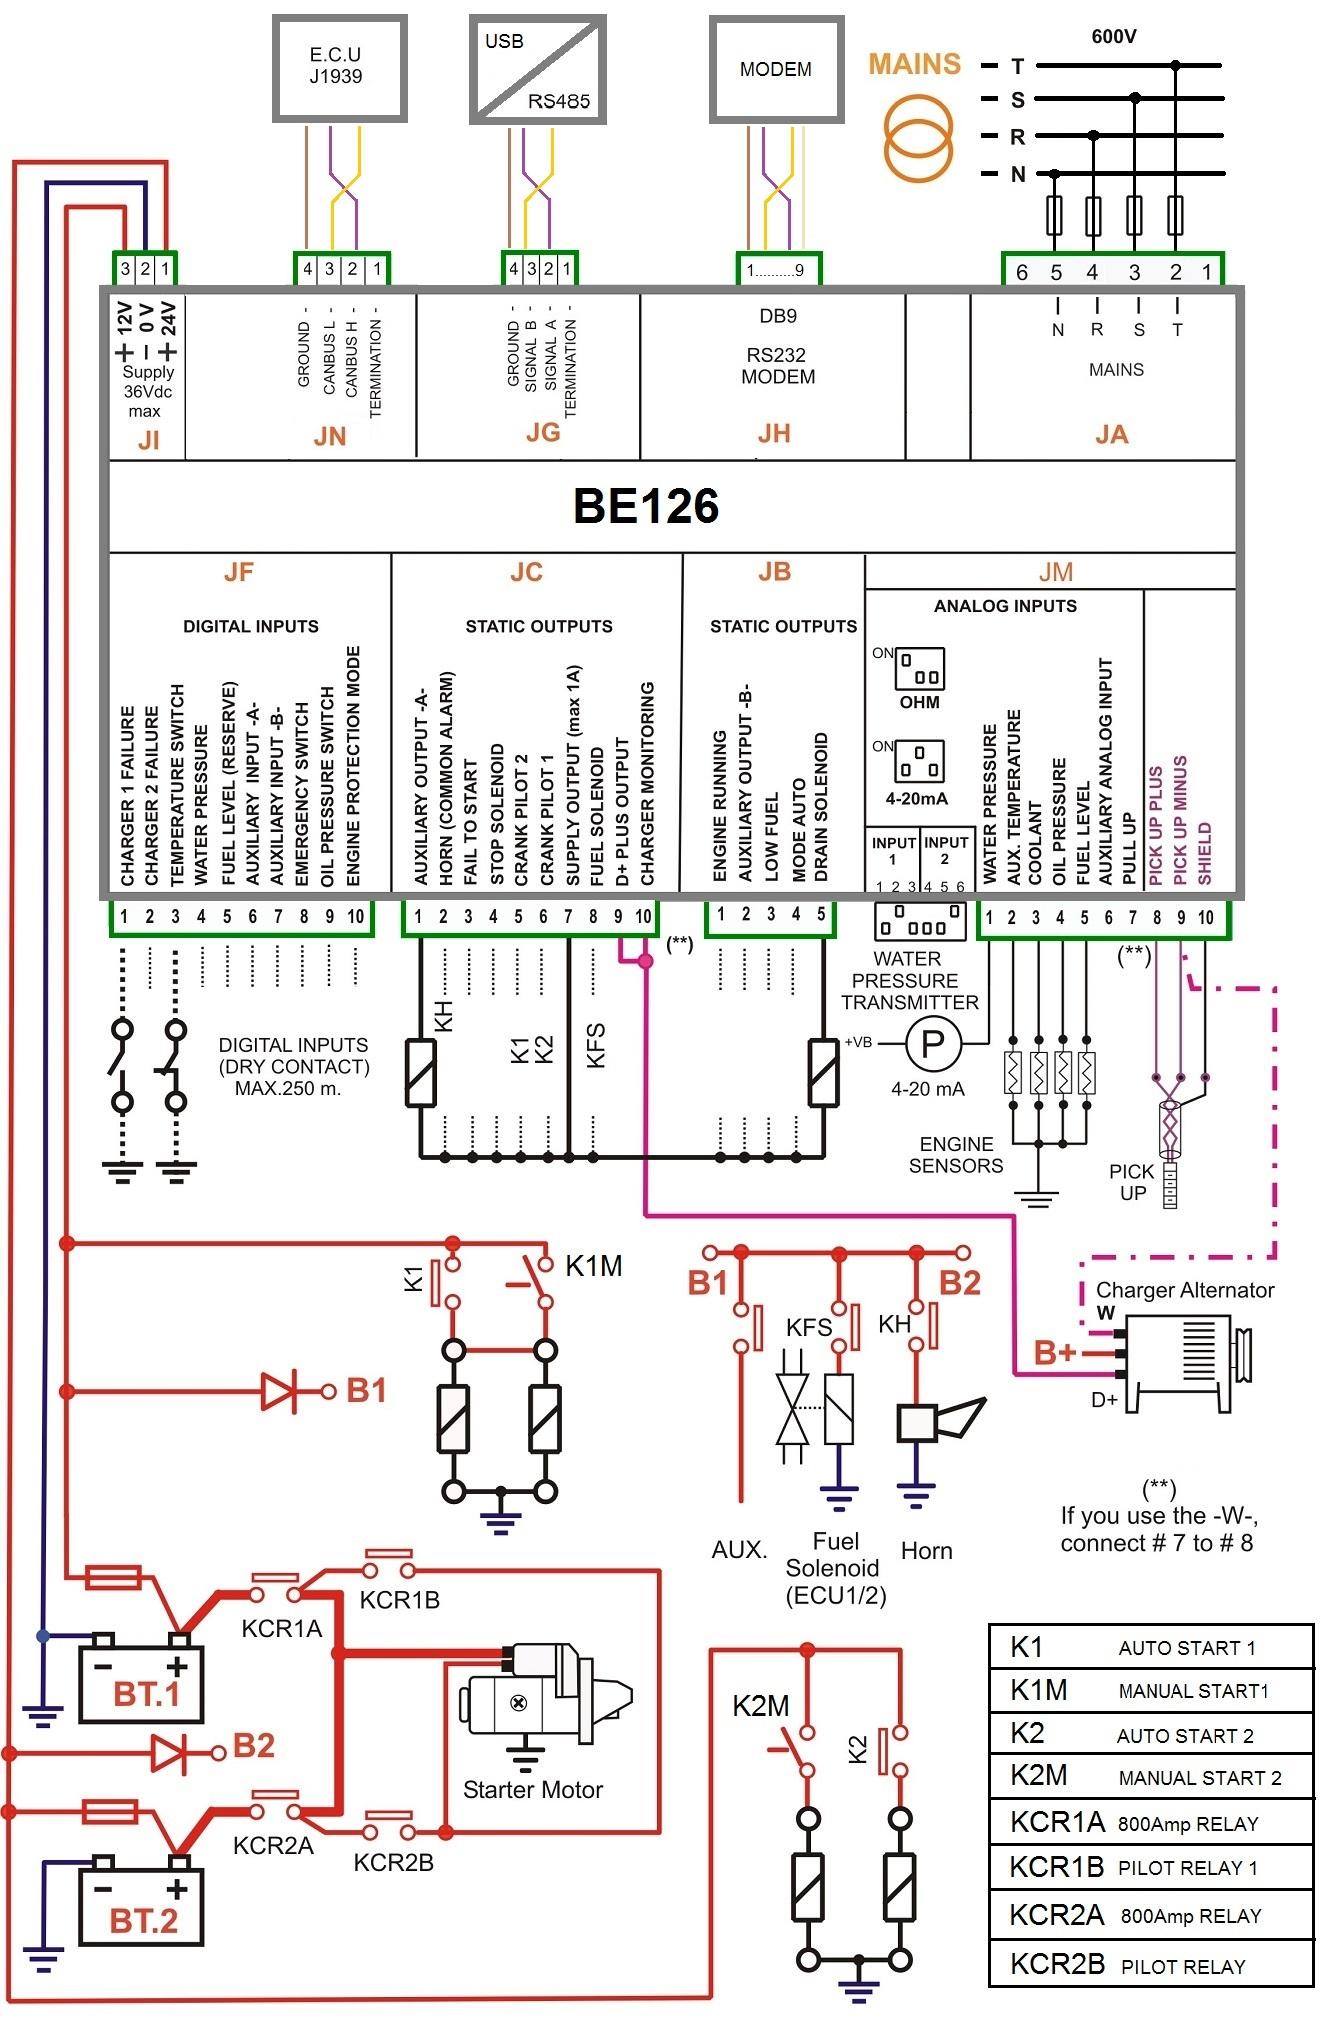 hight resolution of electrical control panel wiring diagram pdf electrical control panel wiring diagram pdf new hardinge hlv